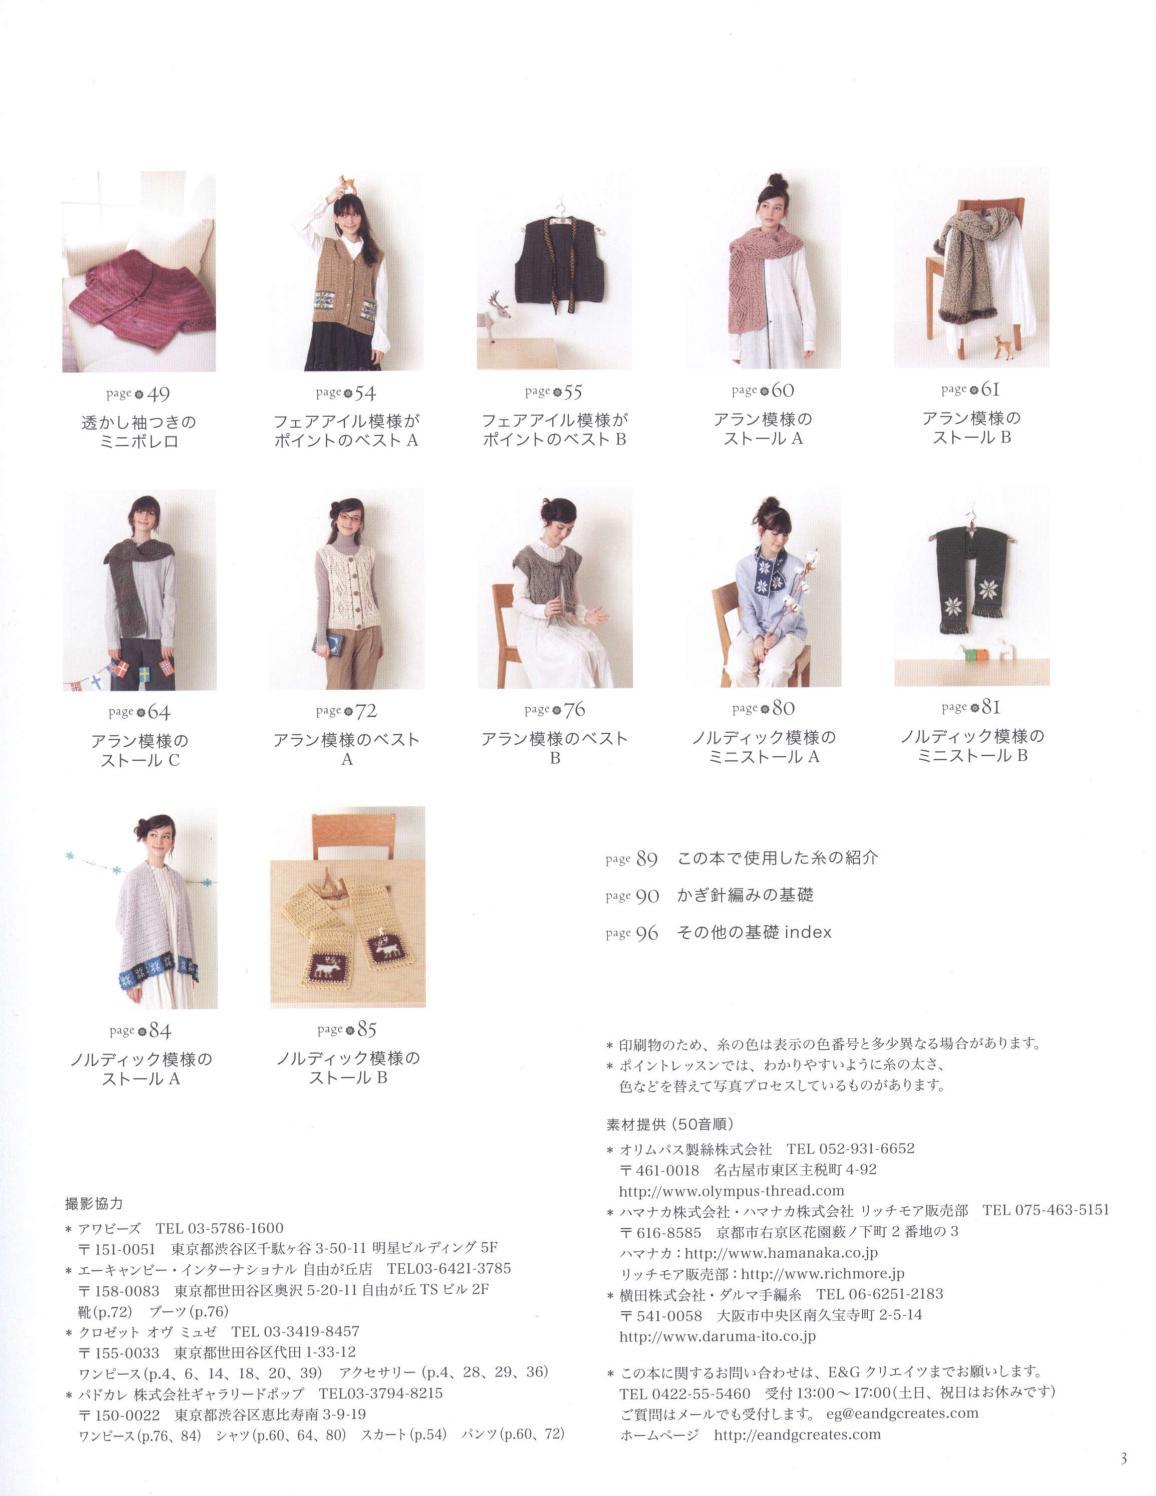 Asahi original crochet best selection 2012 page 3